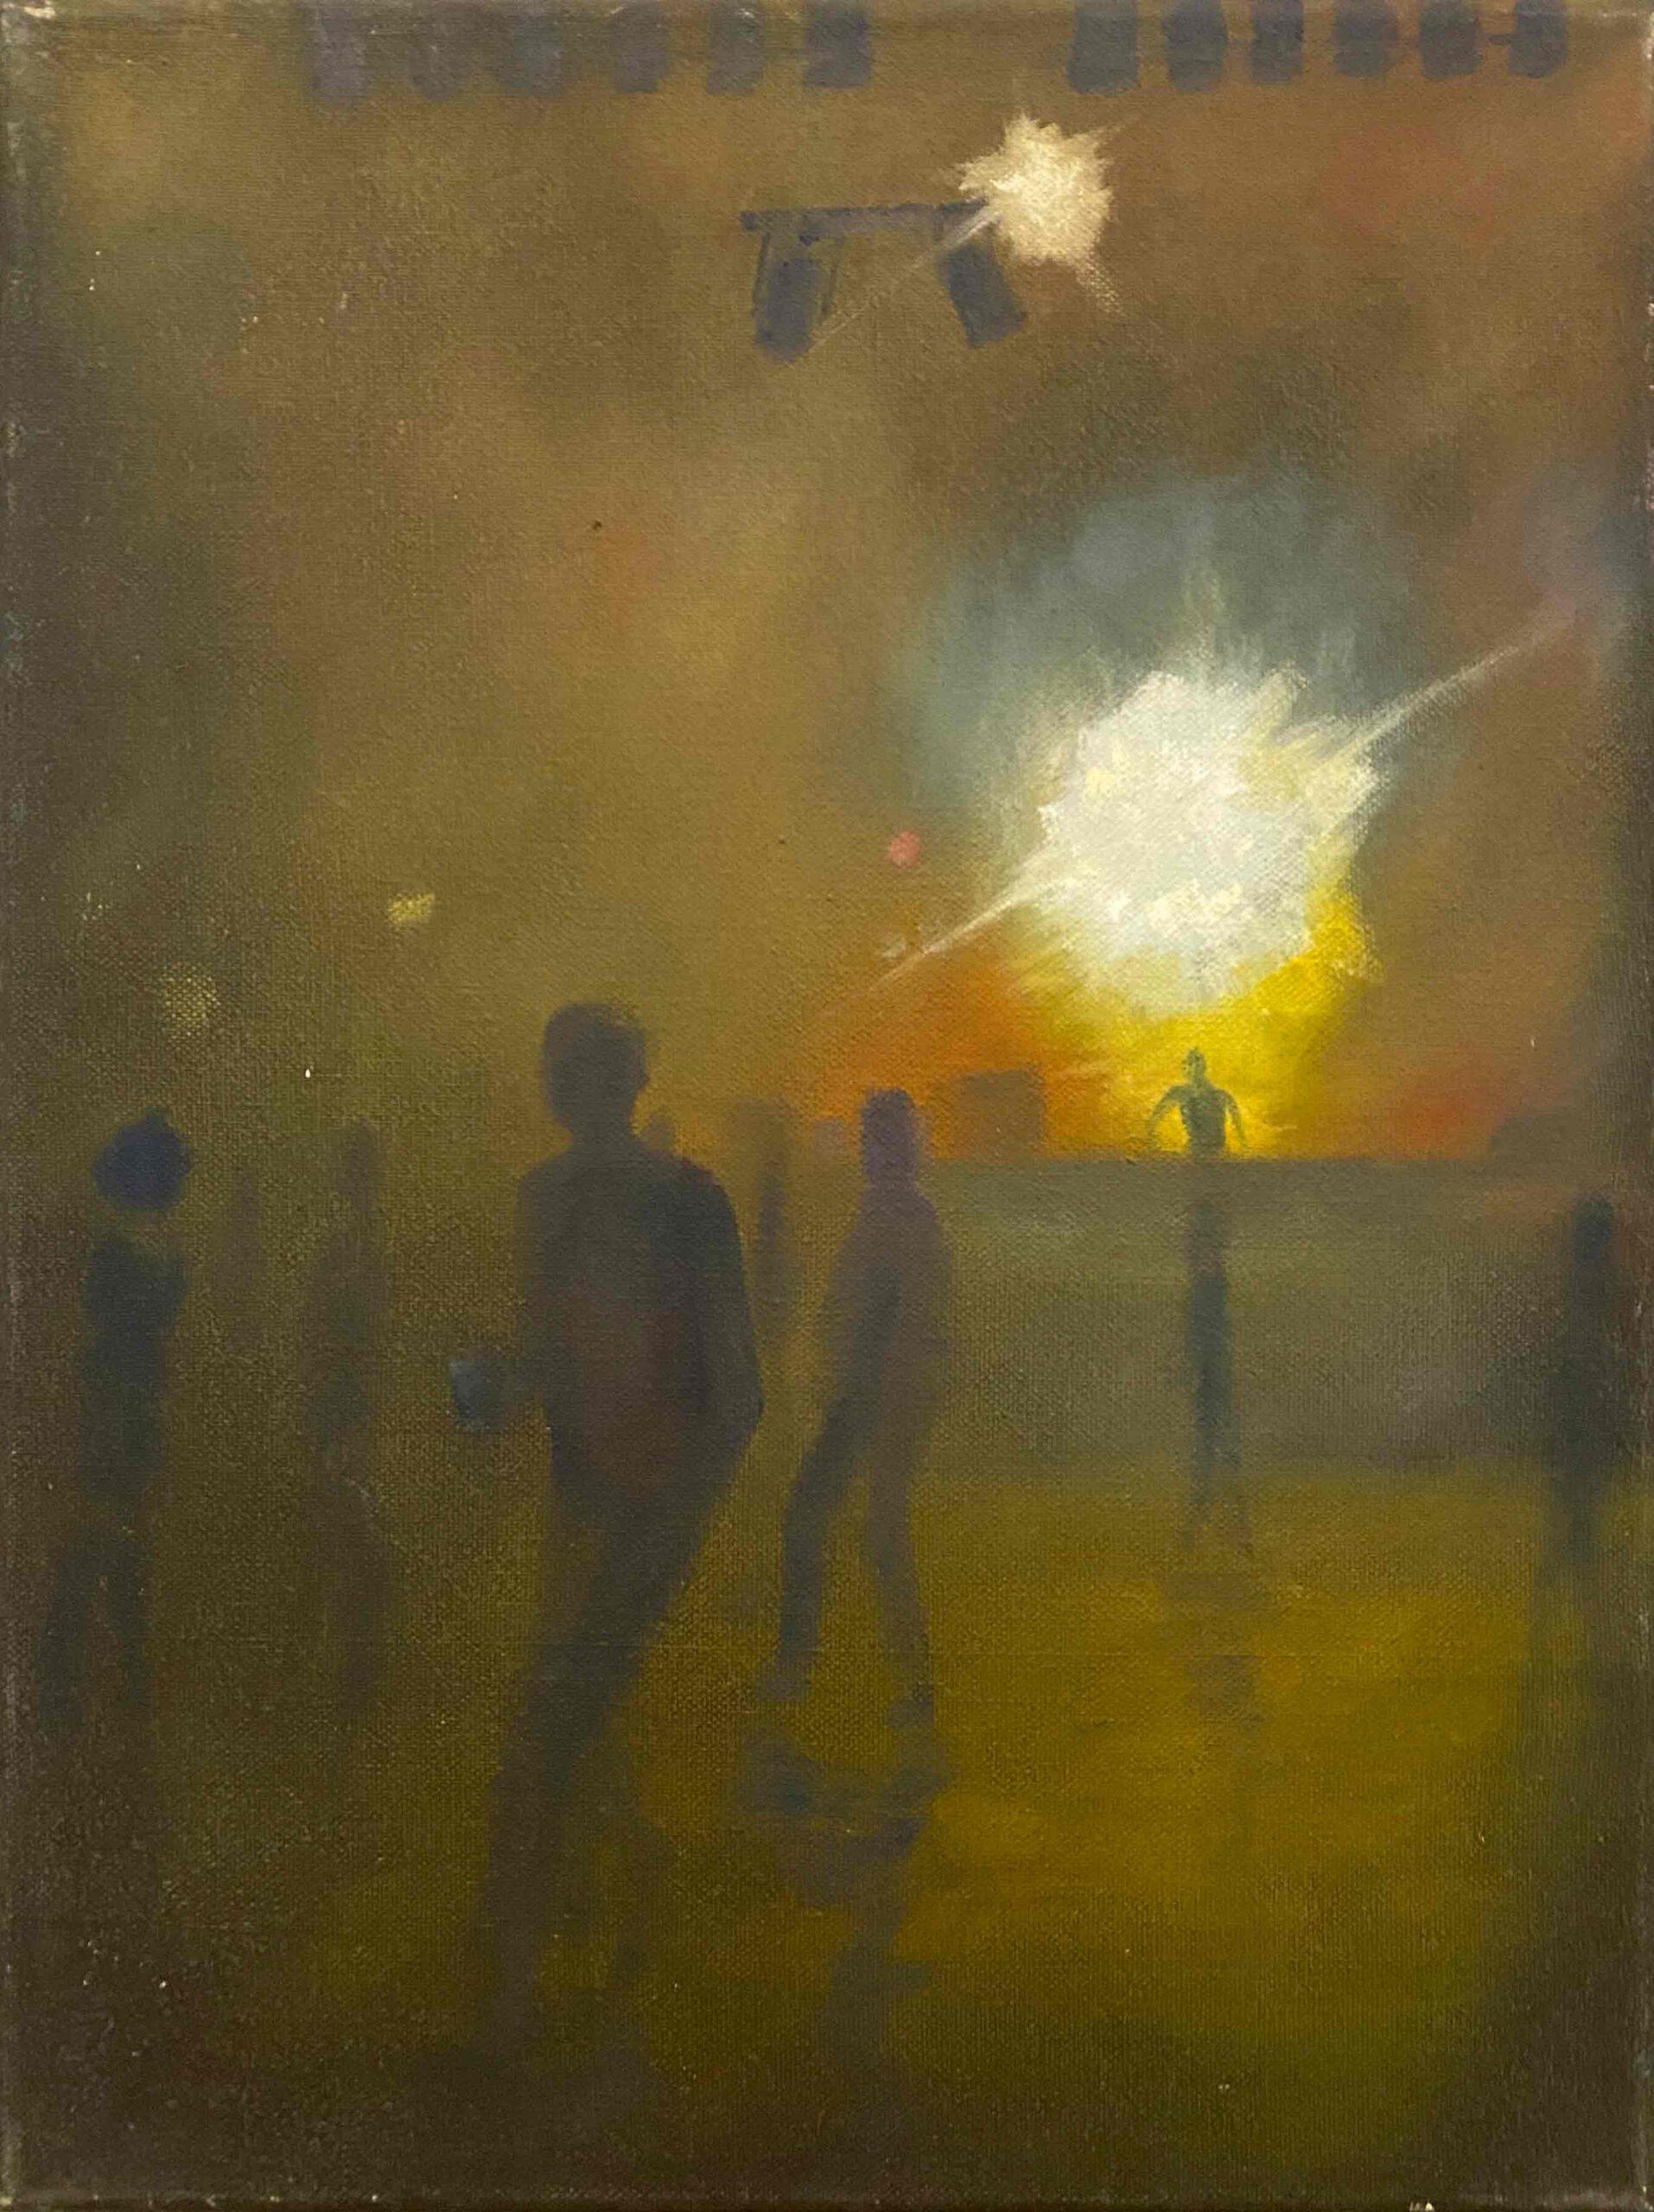 """Neonlights II, SO 36"" Öl auf Leinwand, 40 x 30 cm, Felix Rieger 2013"